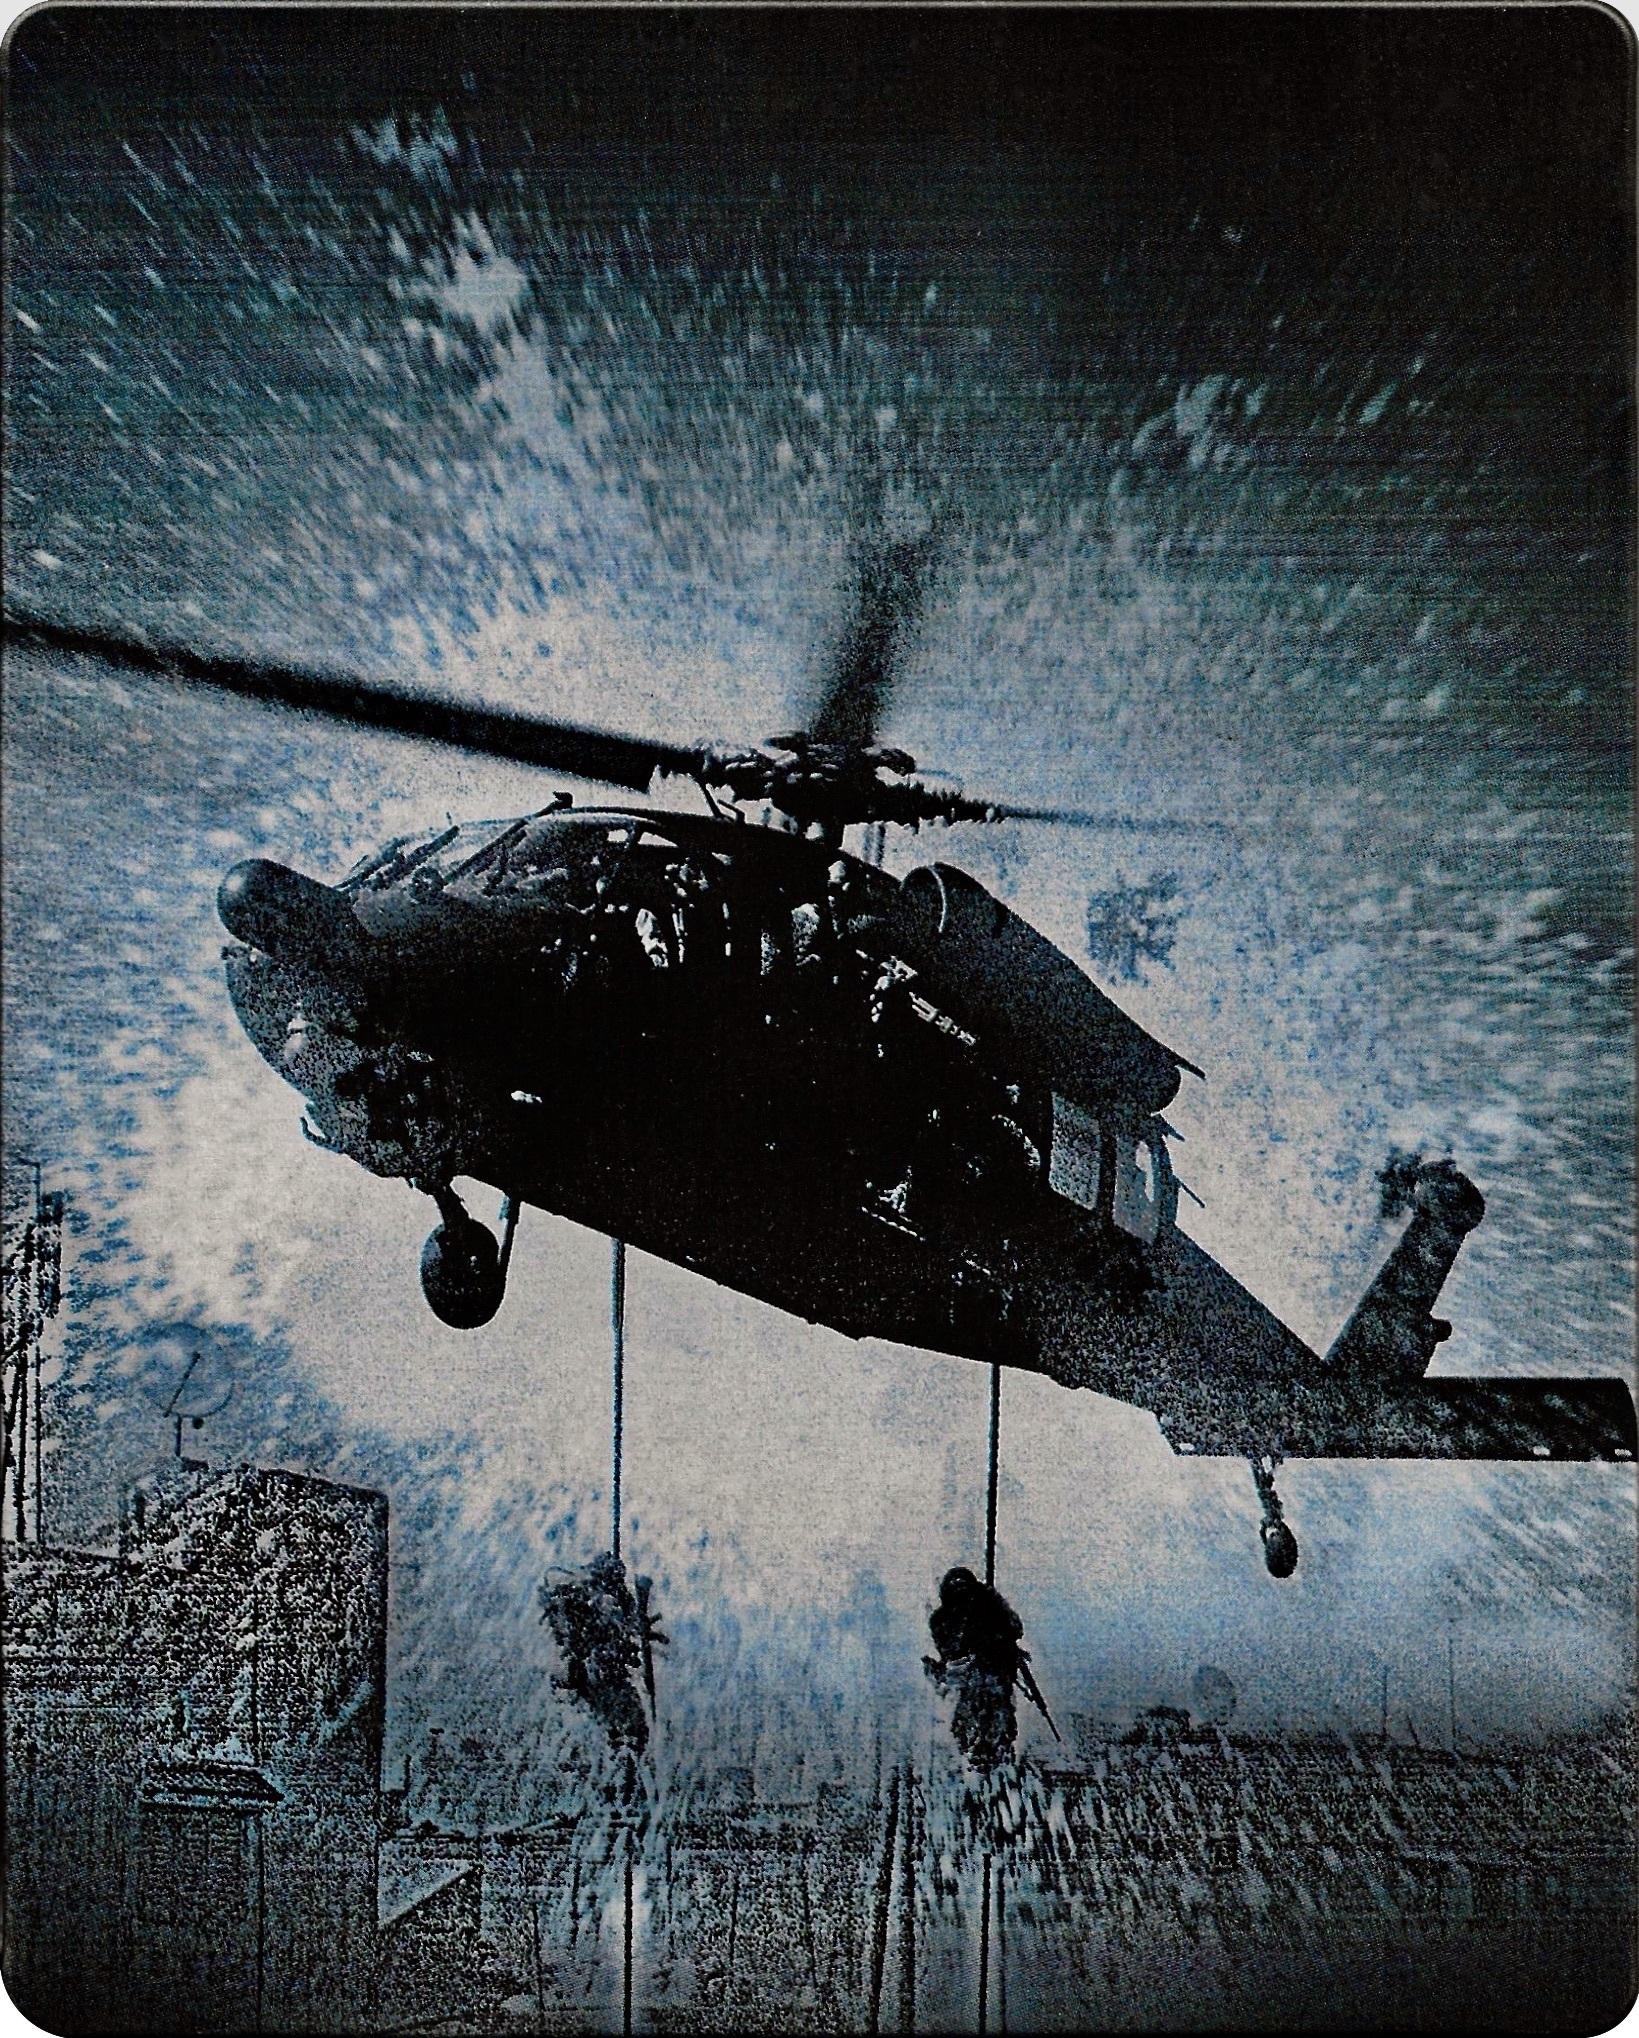 Black Hawk Down (SteelBook)(4K Ultra HD Blu-ray)(Pre-order / May 7)